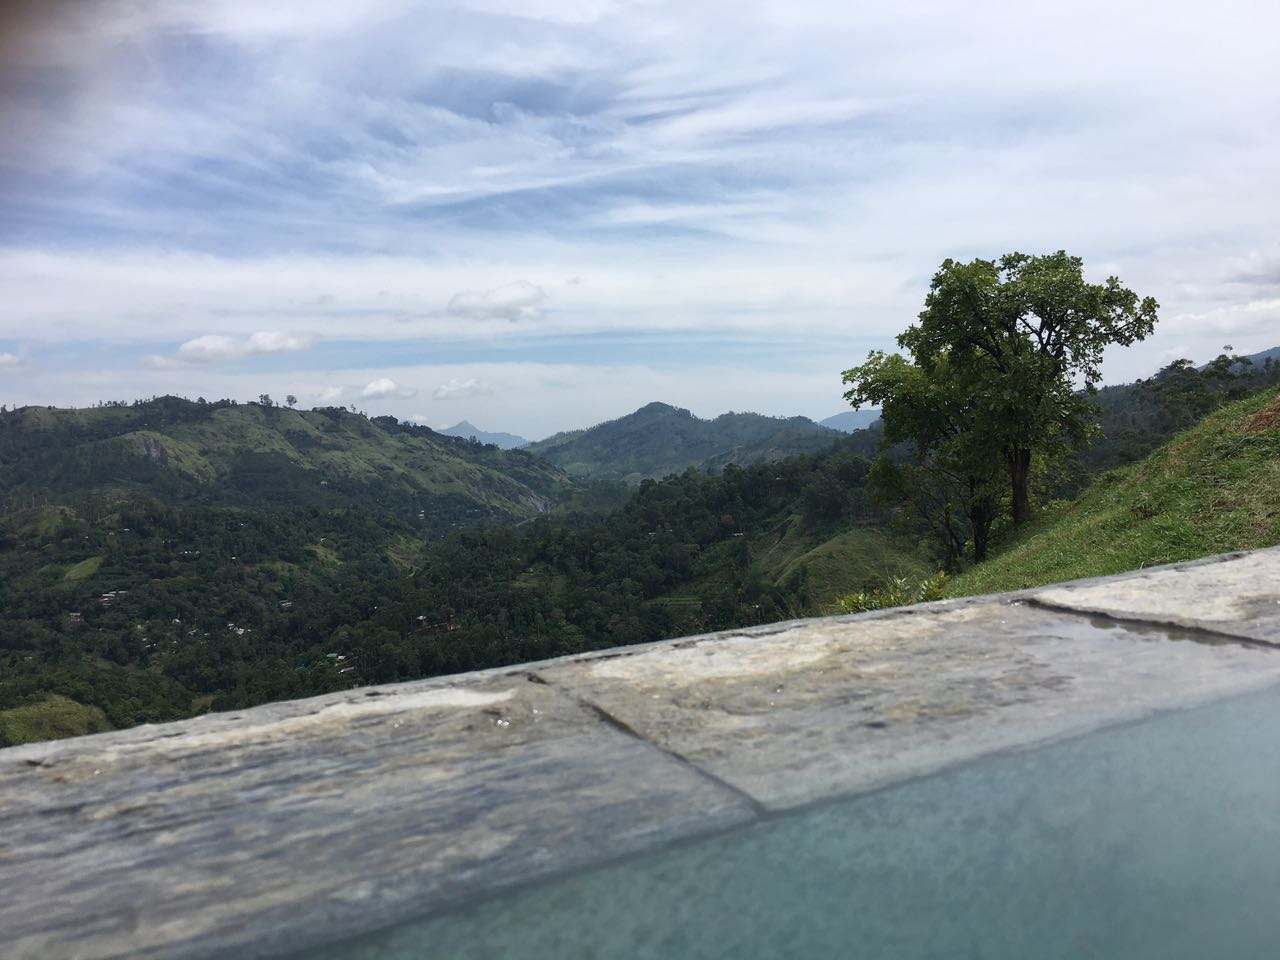 invite-to-paradise-sri-lanka-specialists-experts-travel-agent-tour-operator-secret-ella-16.jpg